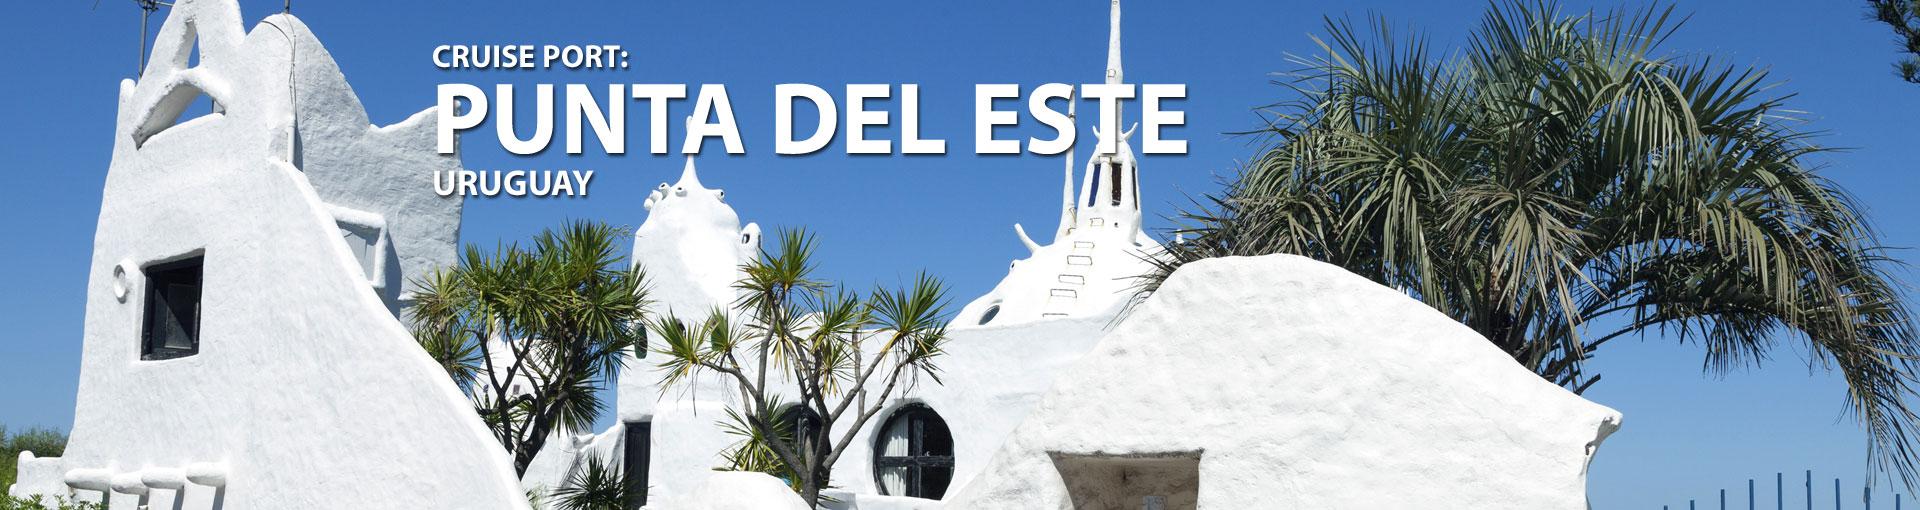 Cruises to Punta Del Este, Uruguay